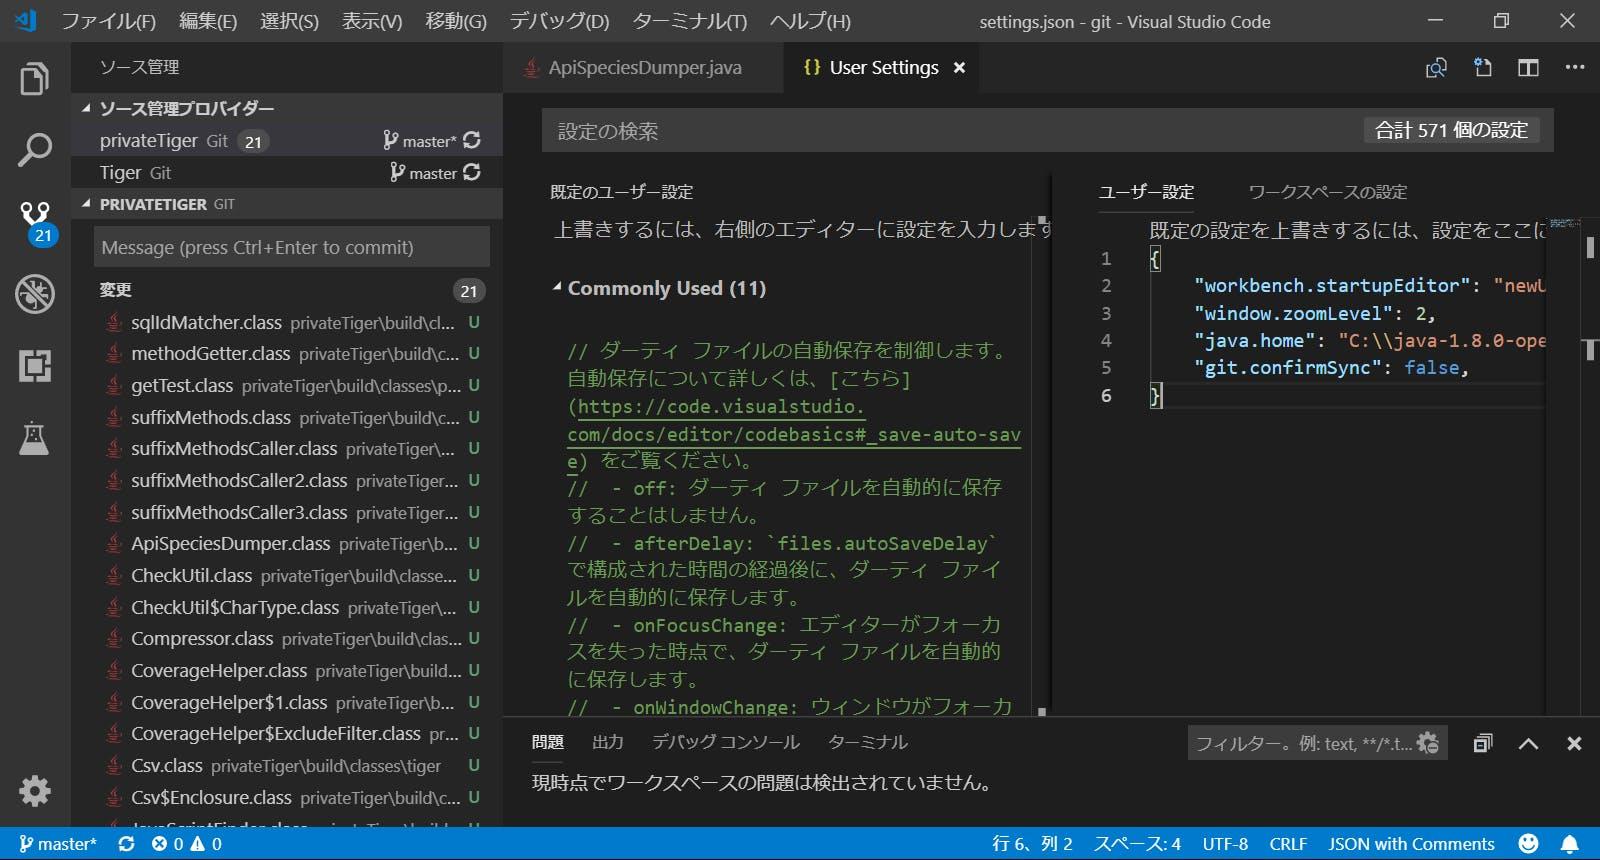 SnapCrab_settingsjson - git - Visual Studio Code_2019-1-19_23-45-2_No-00.png